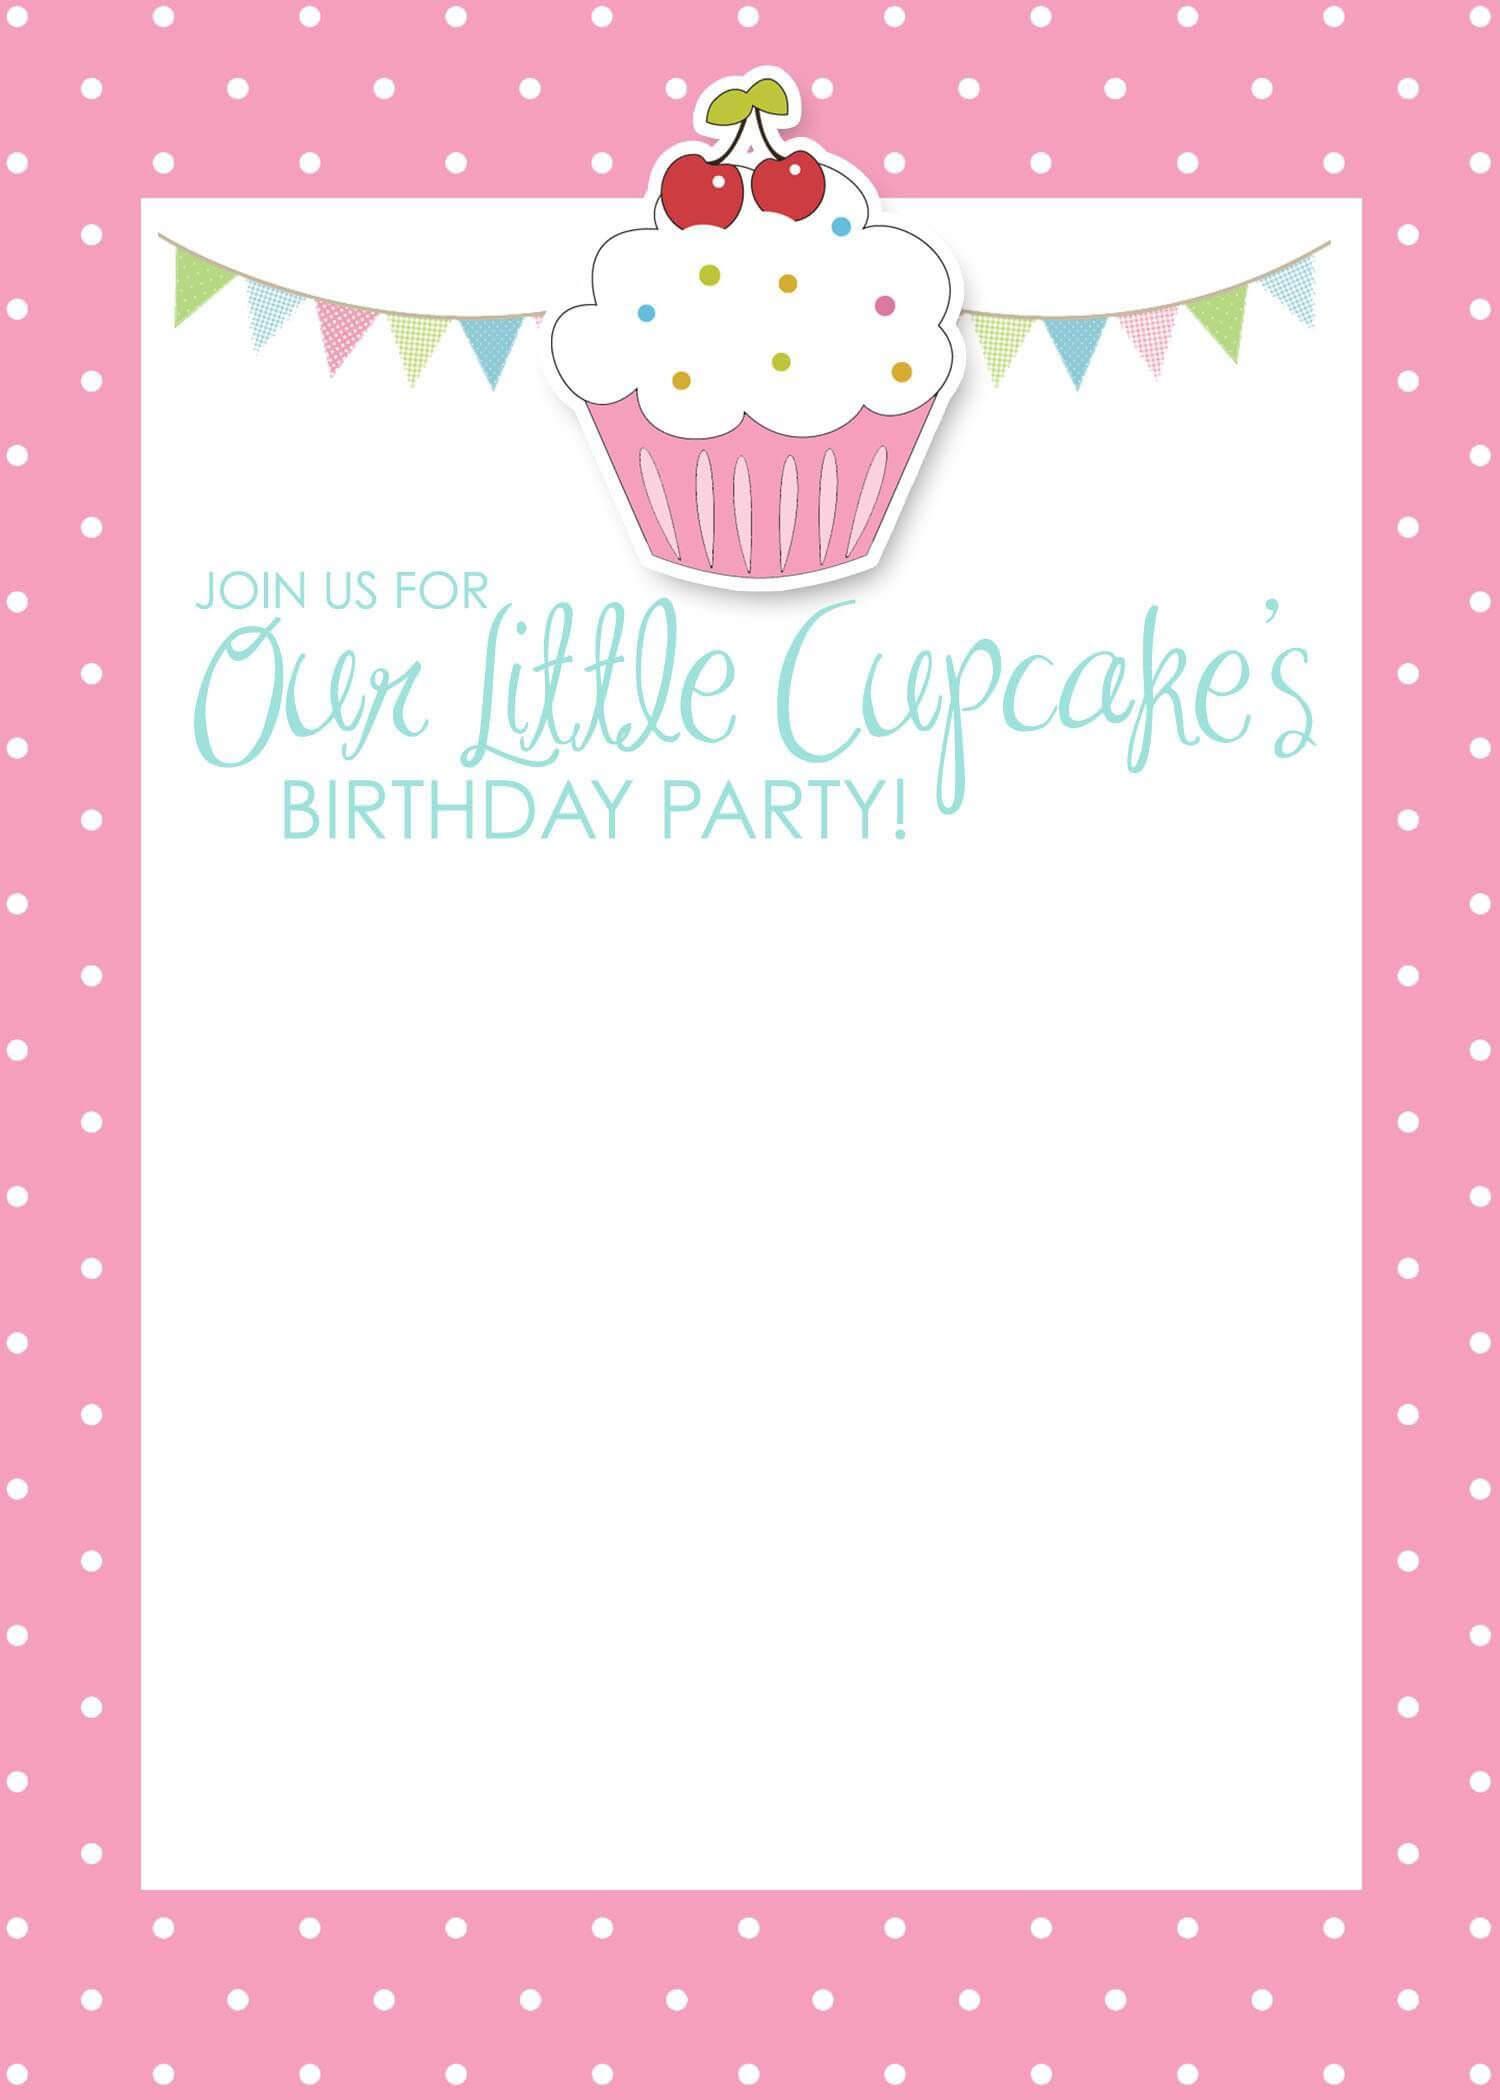 008 Microsoft Word Birthday Card Invitation Template In Birthday Card Template Microsoft Word